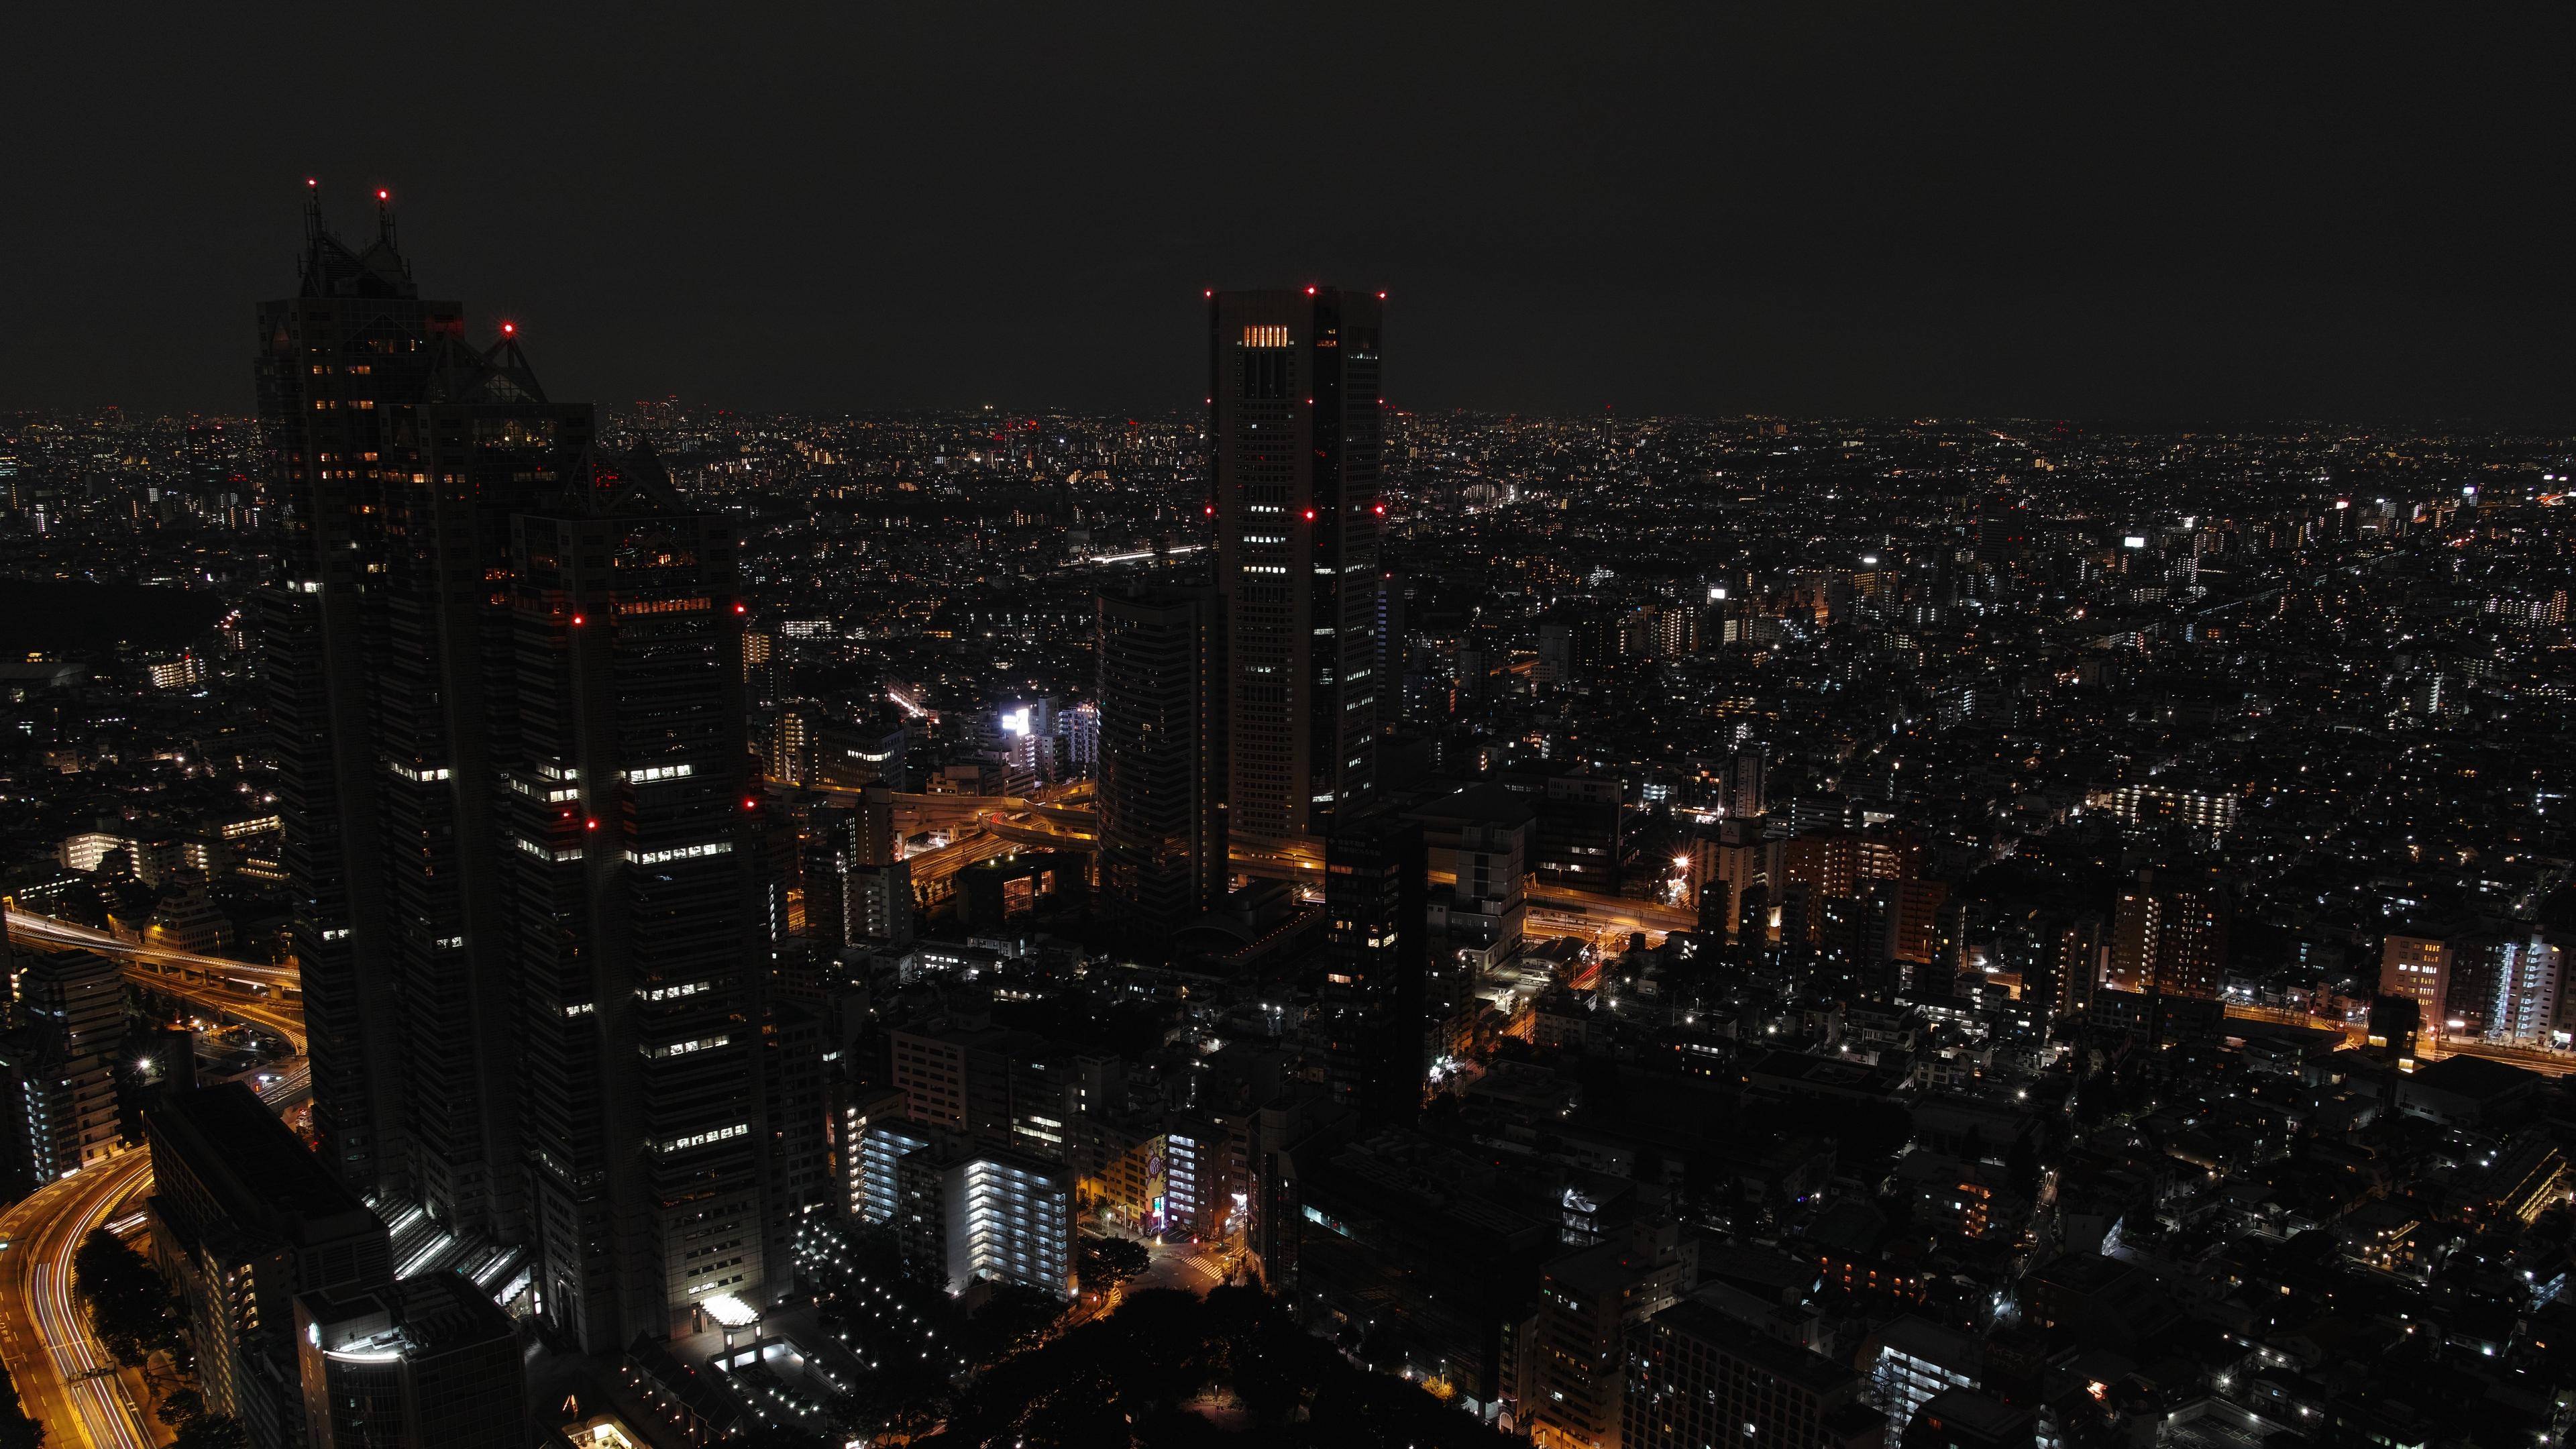 night city skyscrapers tokyo night 4k 1538068102 - night city, skyscrapers, tokyo, night 4k - Tokyo, Skyscrapers, night city